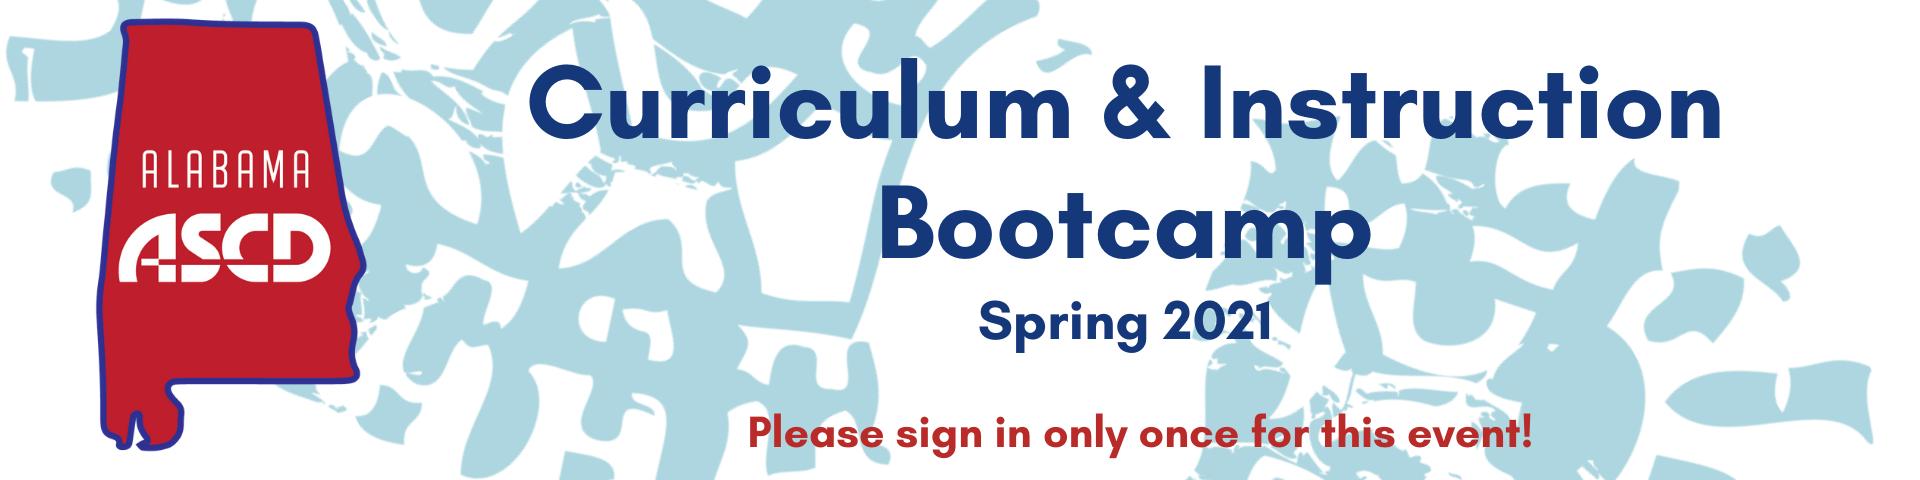 Spring Bootcamp Header